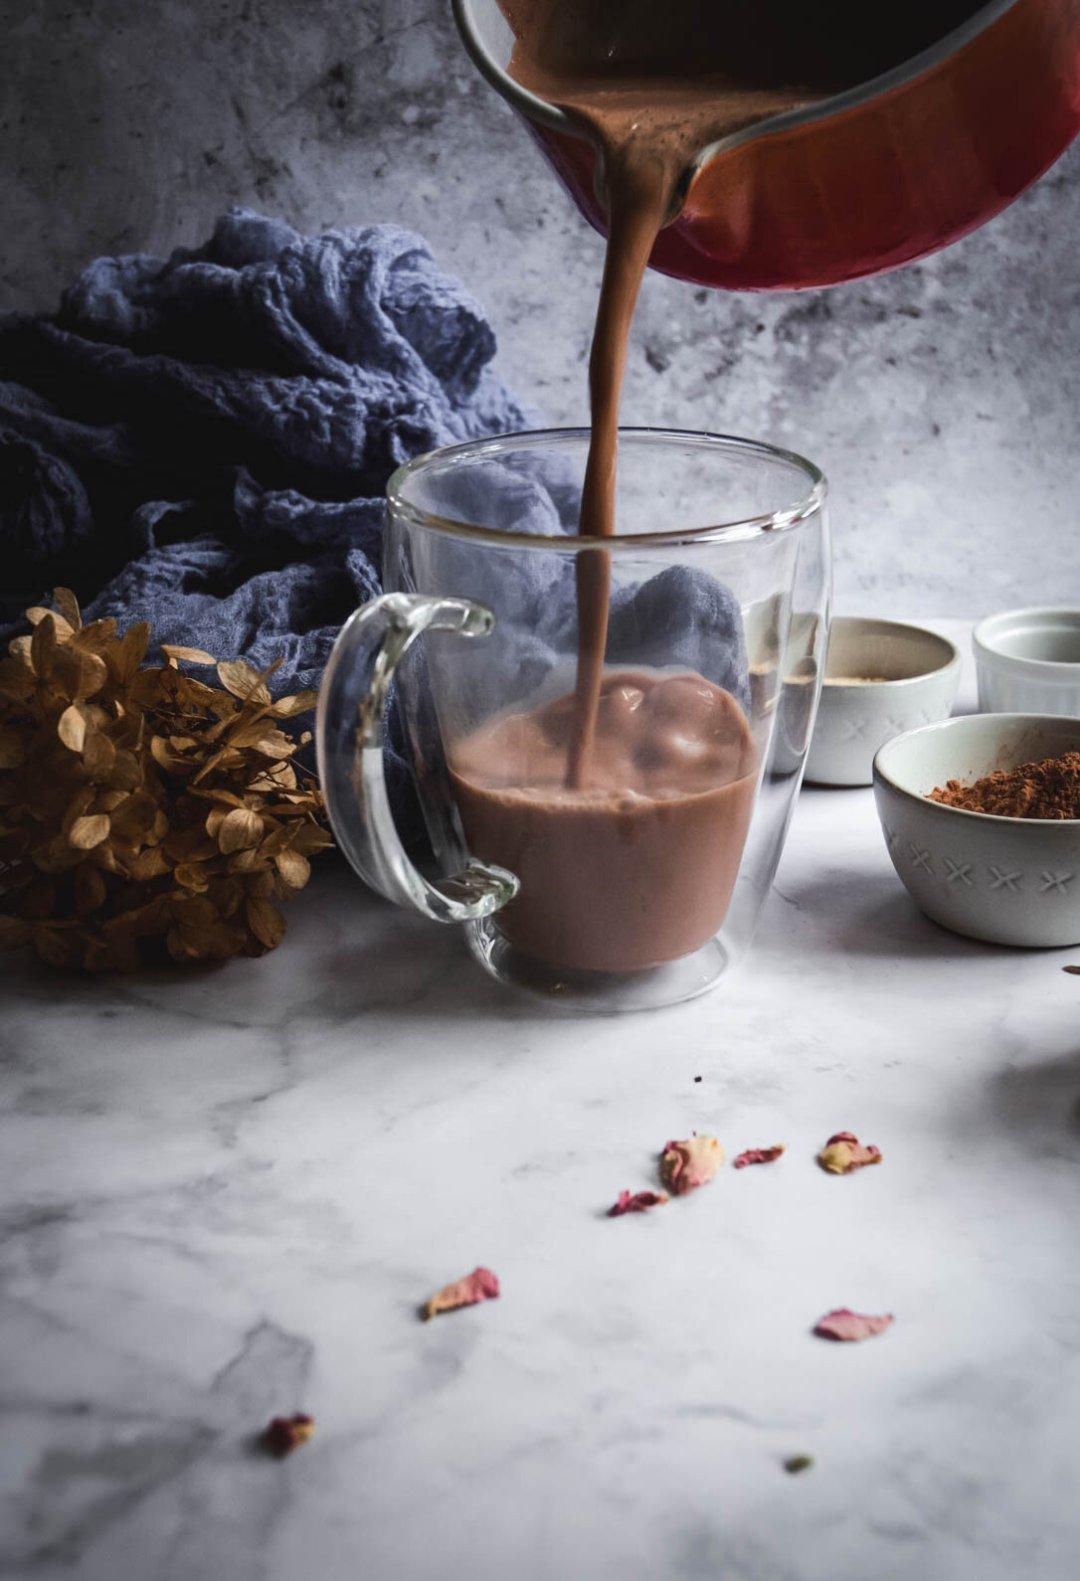 Hot chocolate poured into mug